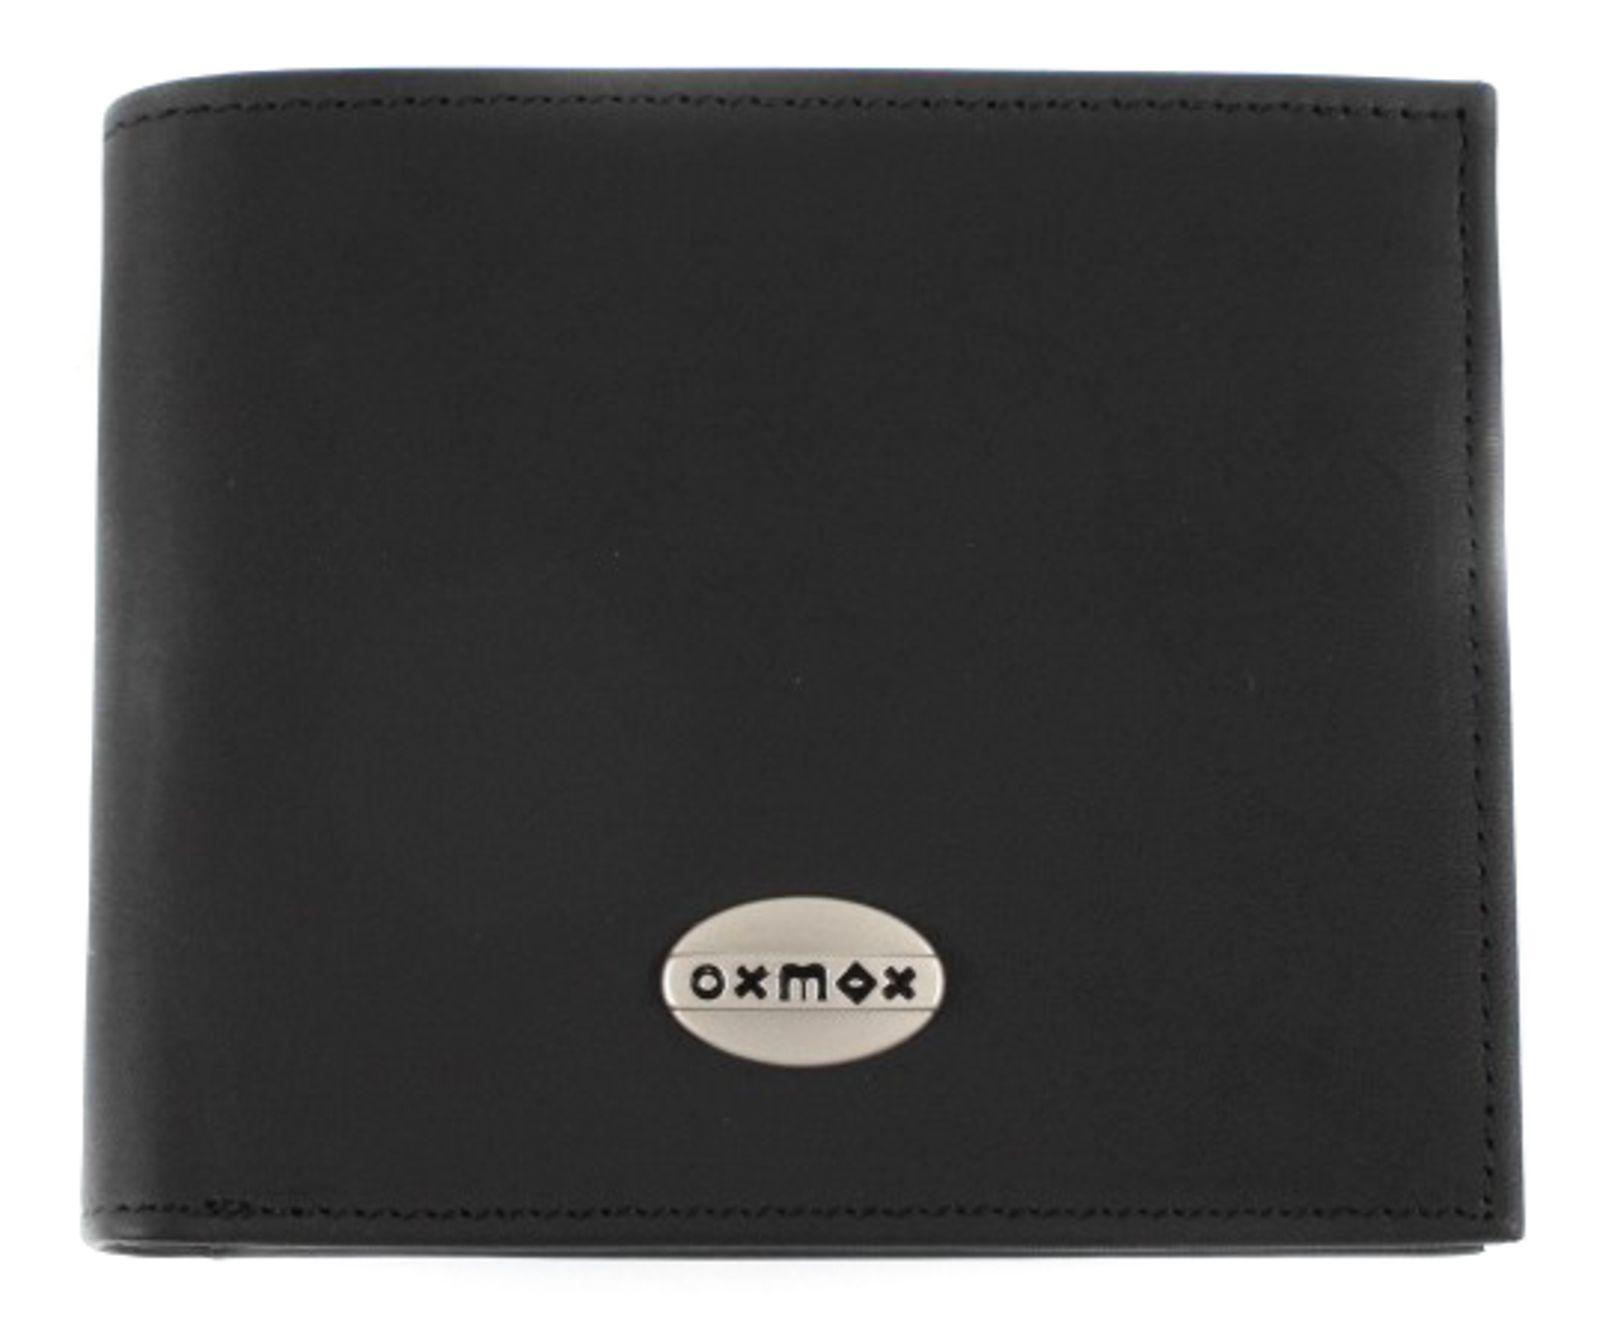 oxmox Leather Querscheinbörse Black